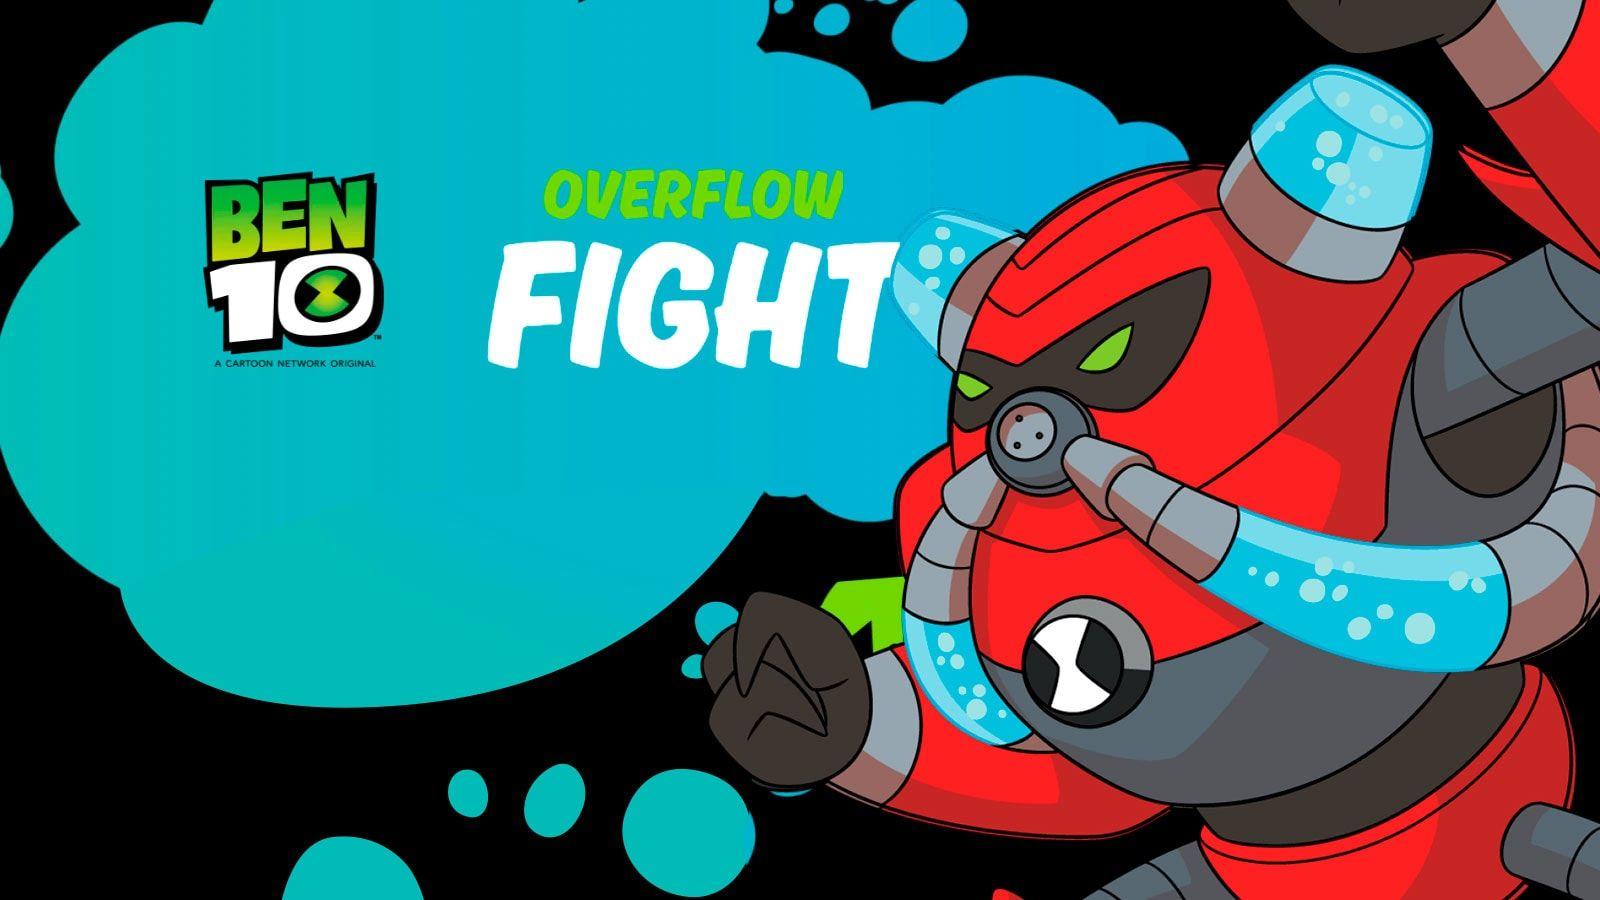 Imagem de Ben 10 - Overflow Fight